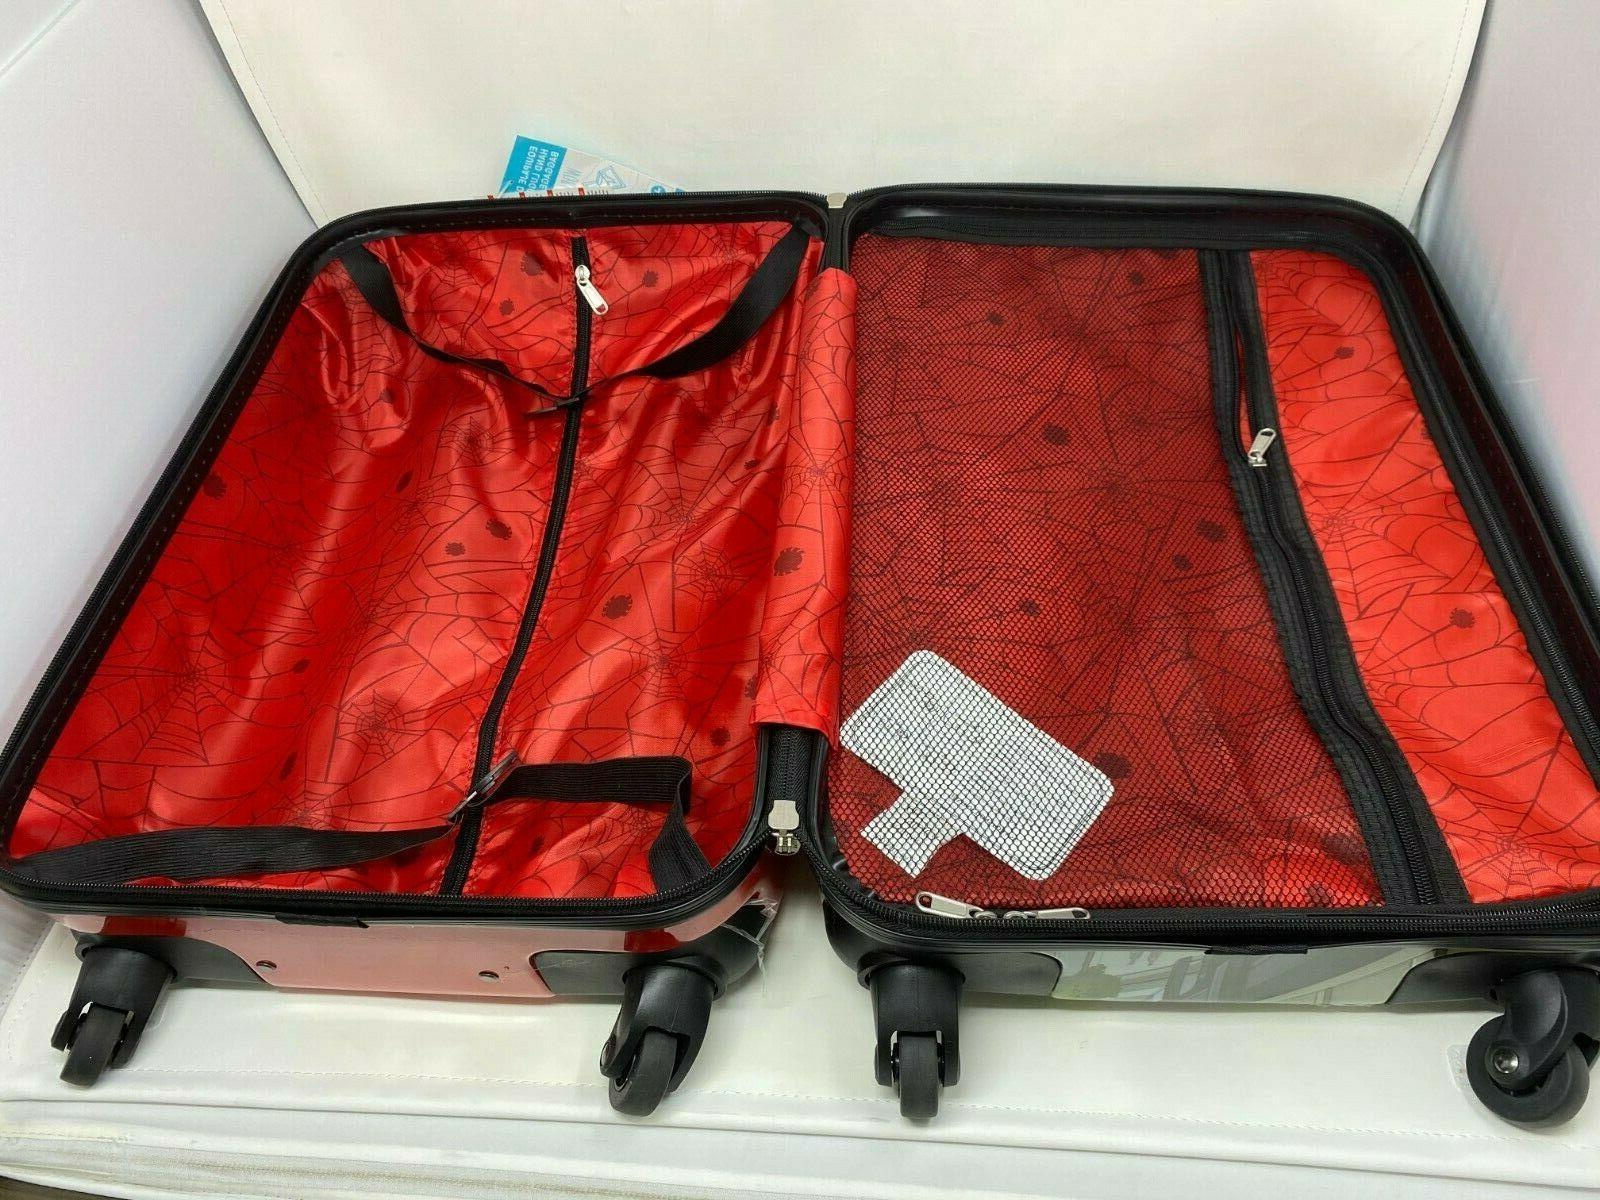 Marvel Luggage - 18